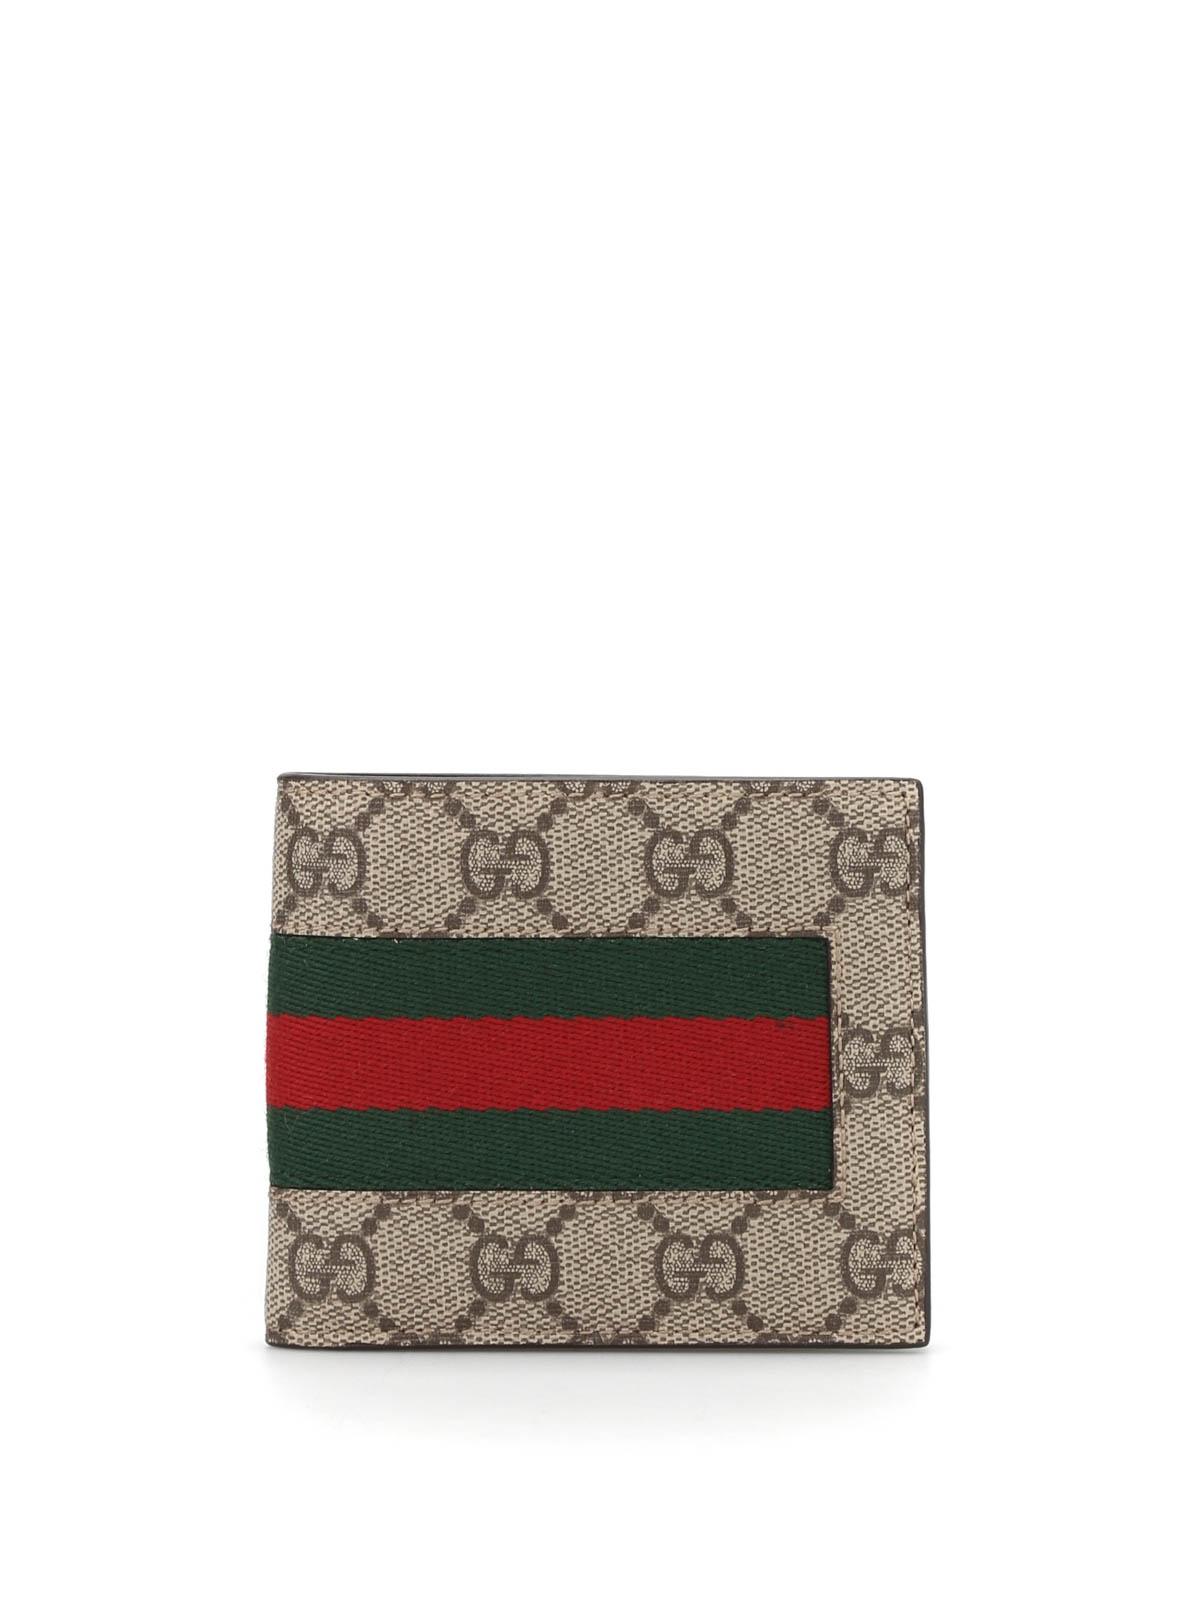 Gucci Web Gg Supreme Wallet Wallets Amp Purses 408827